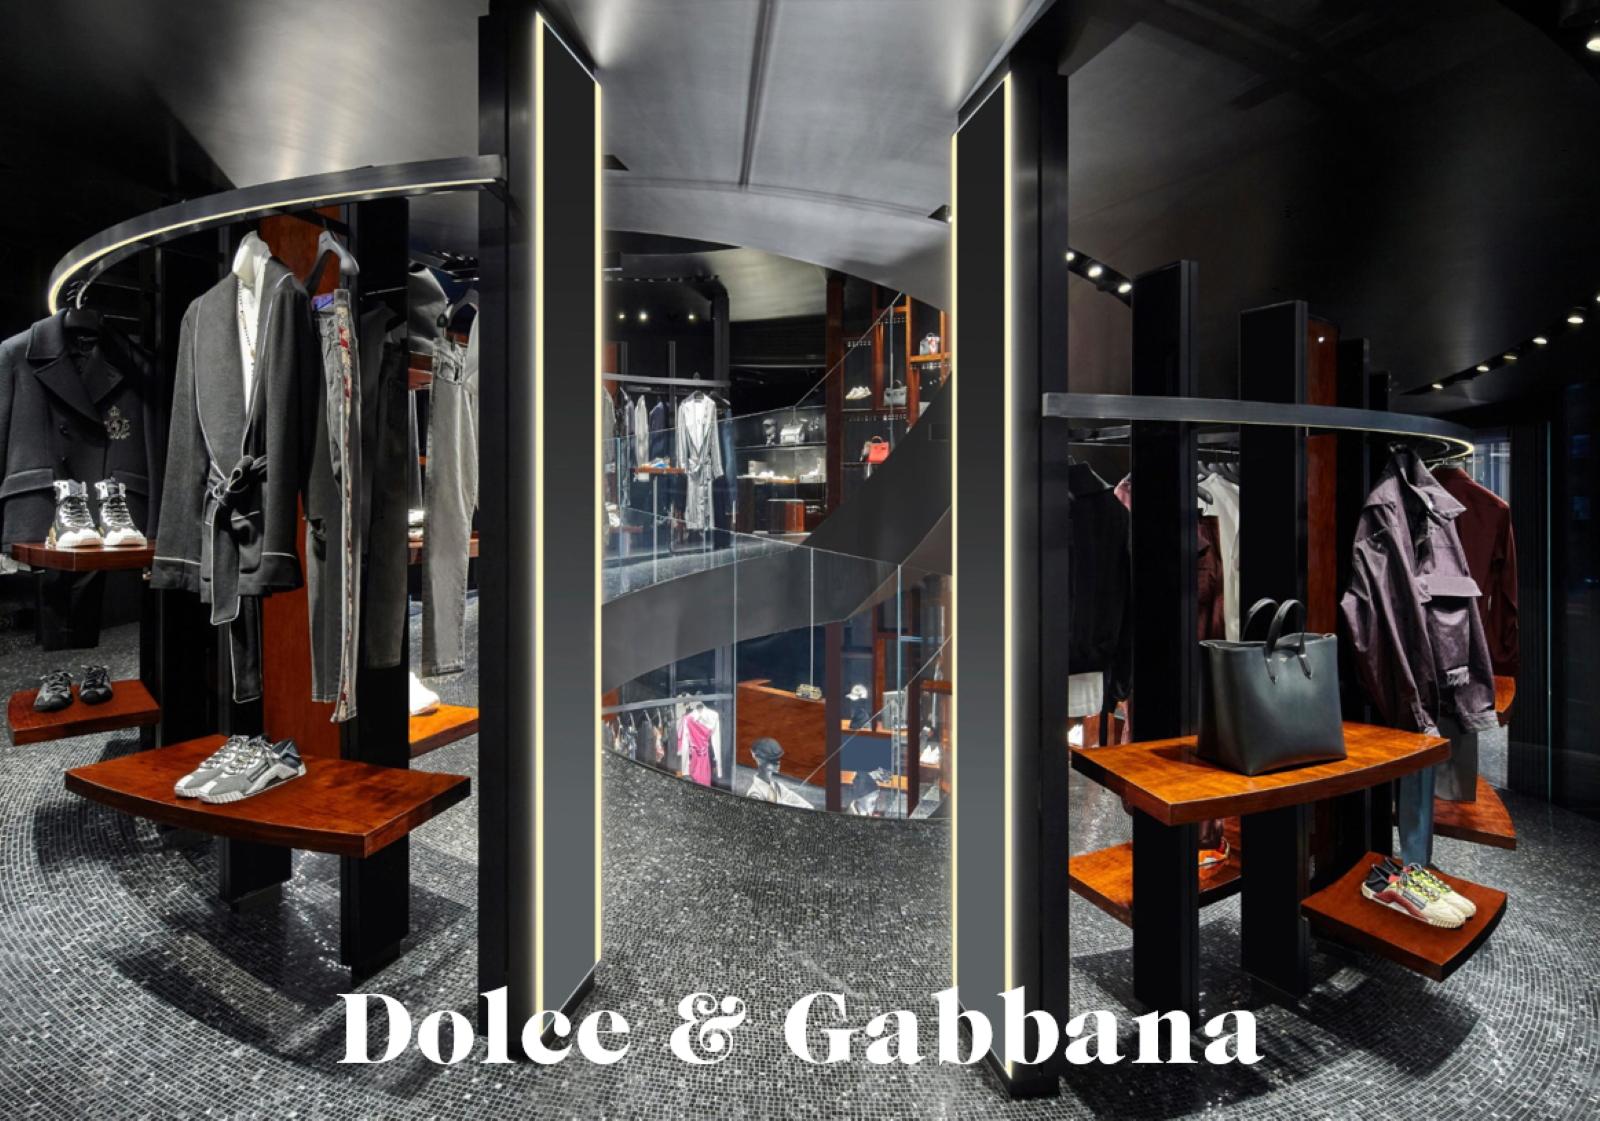 Dolce & gabbana retail tour seoul missions mmm 0